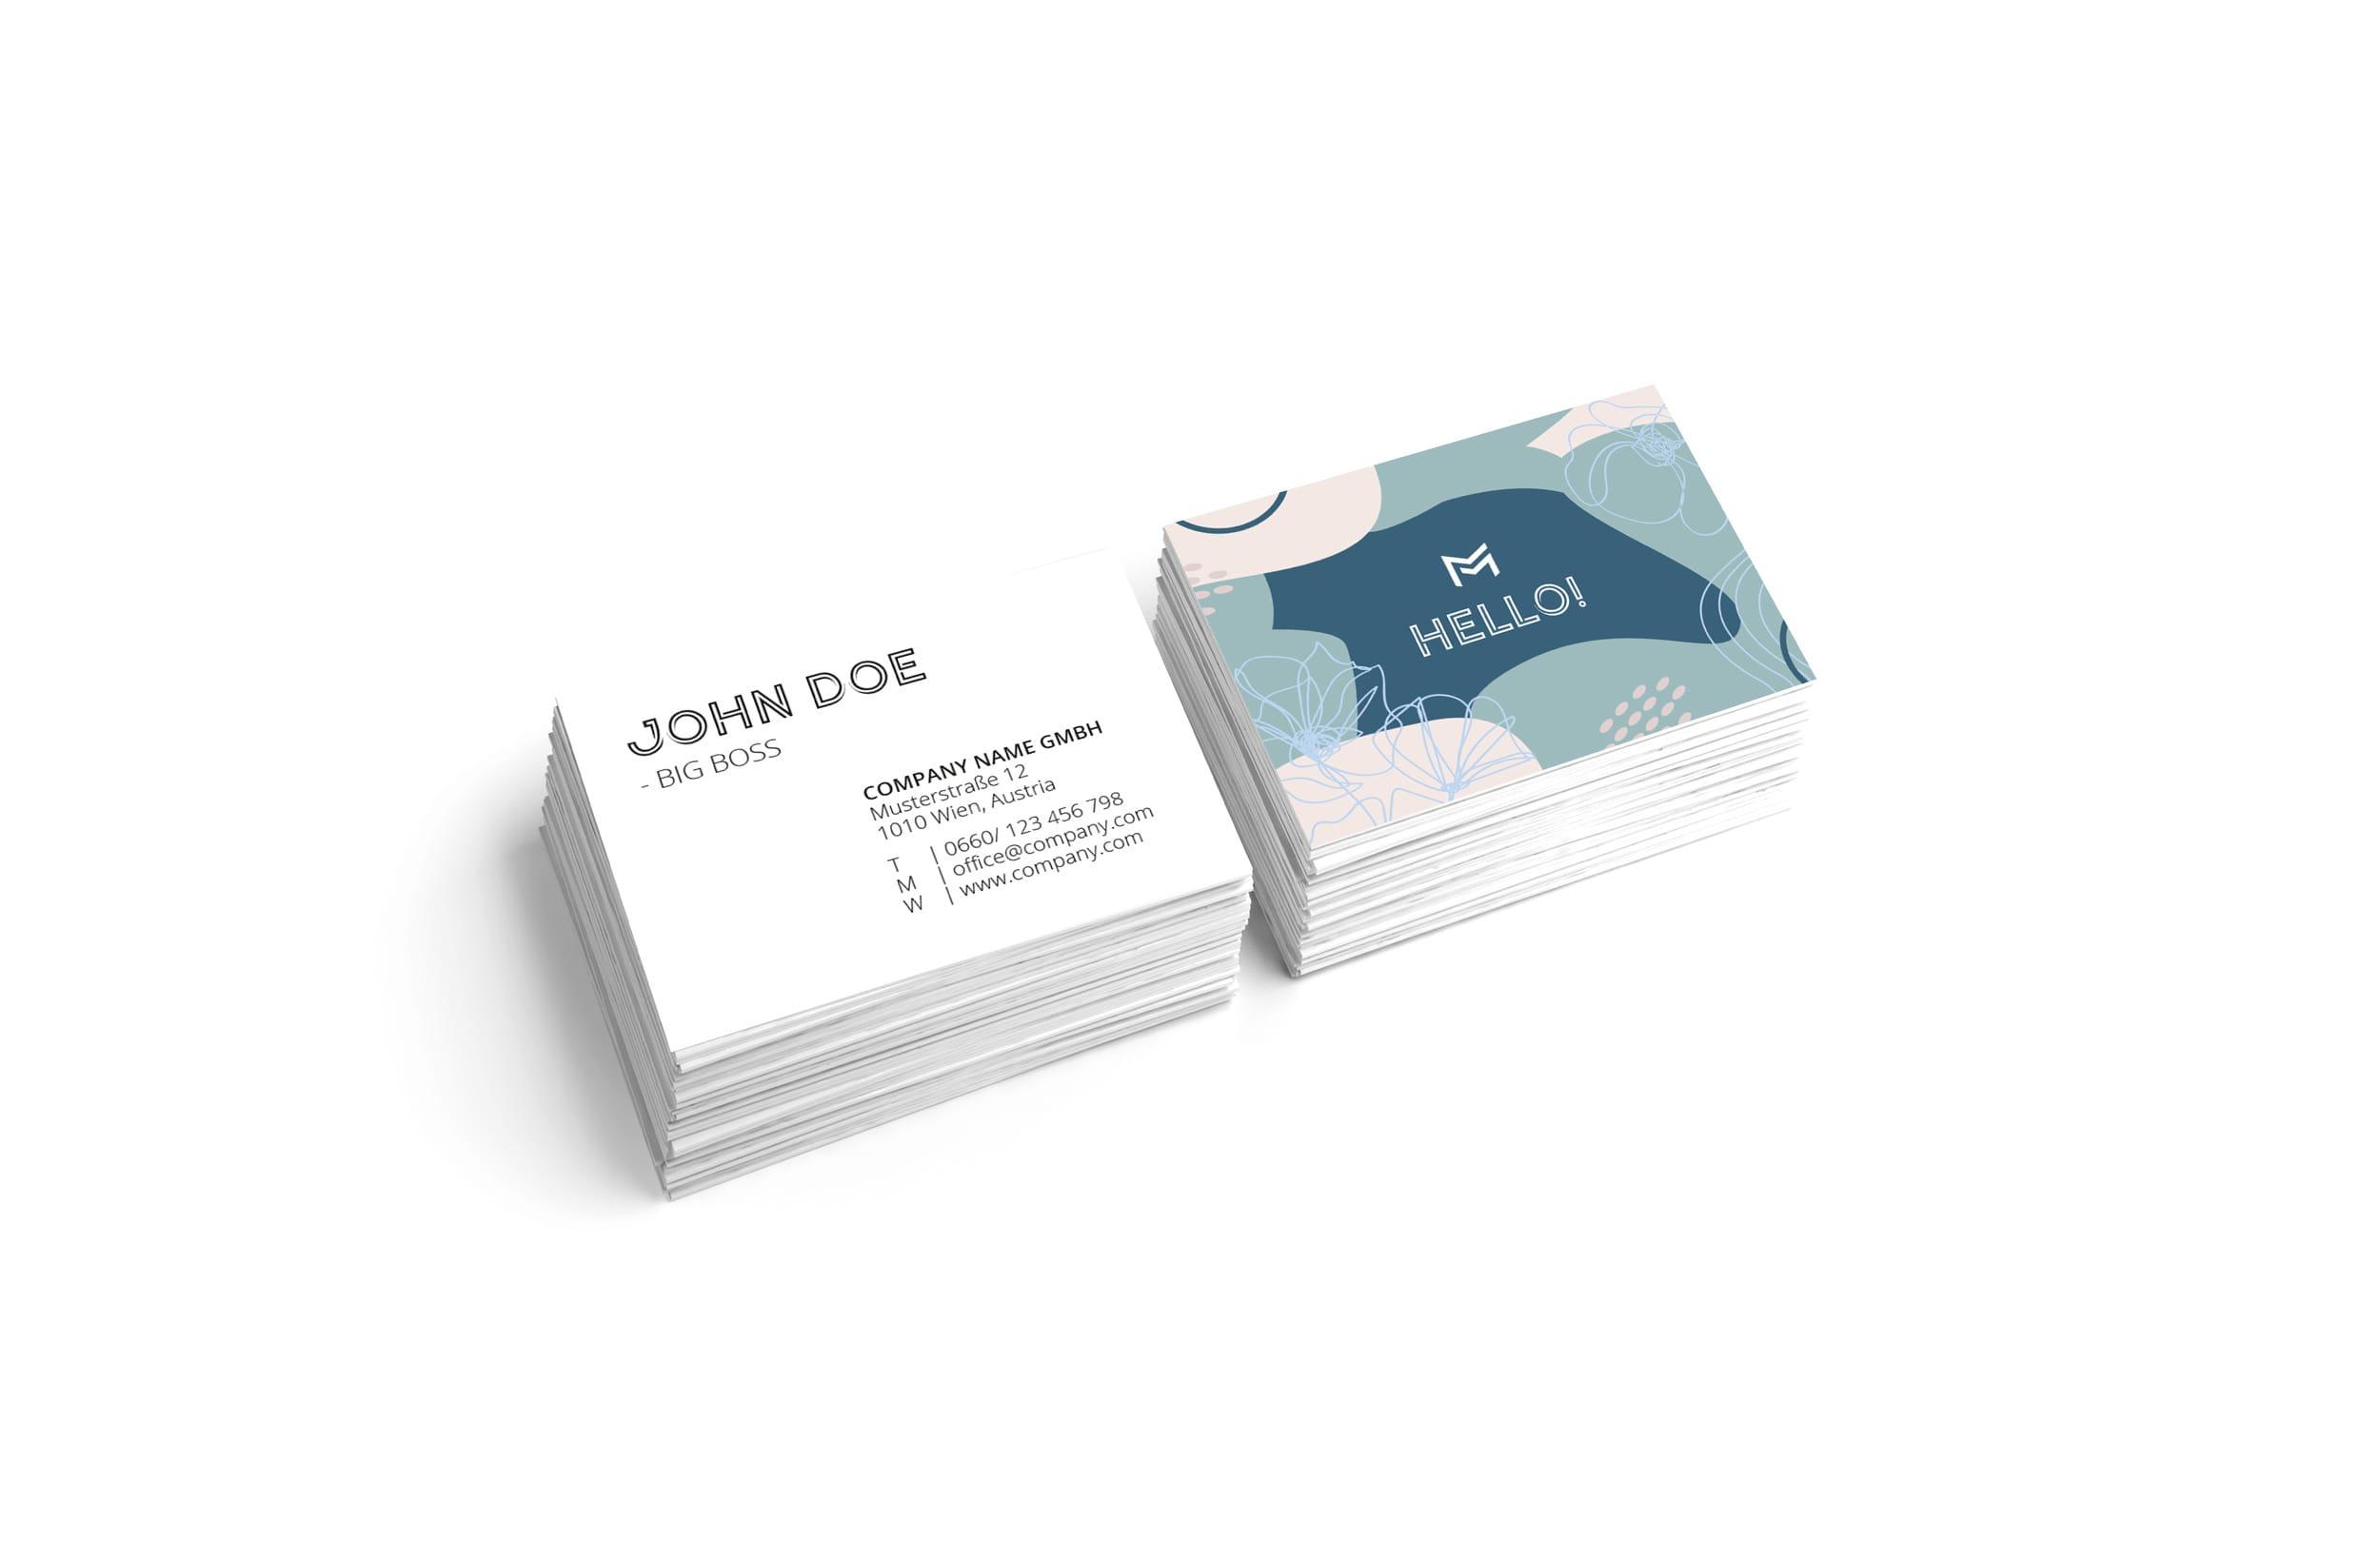 montroit-design-business-card-liq-2-a